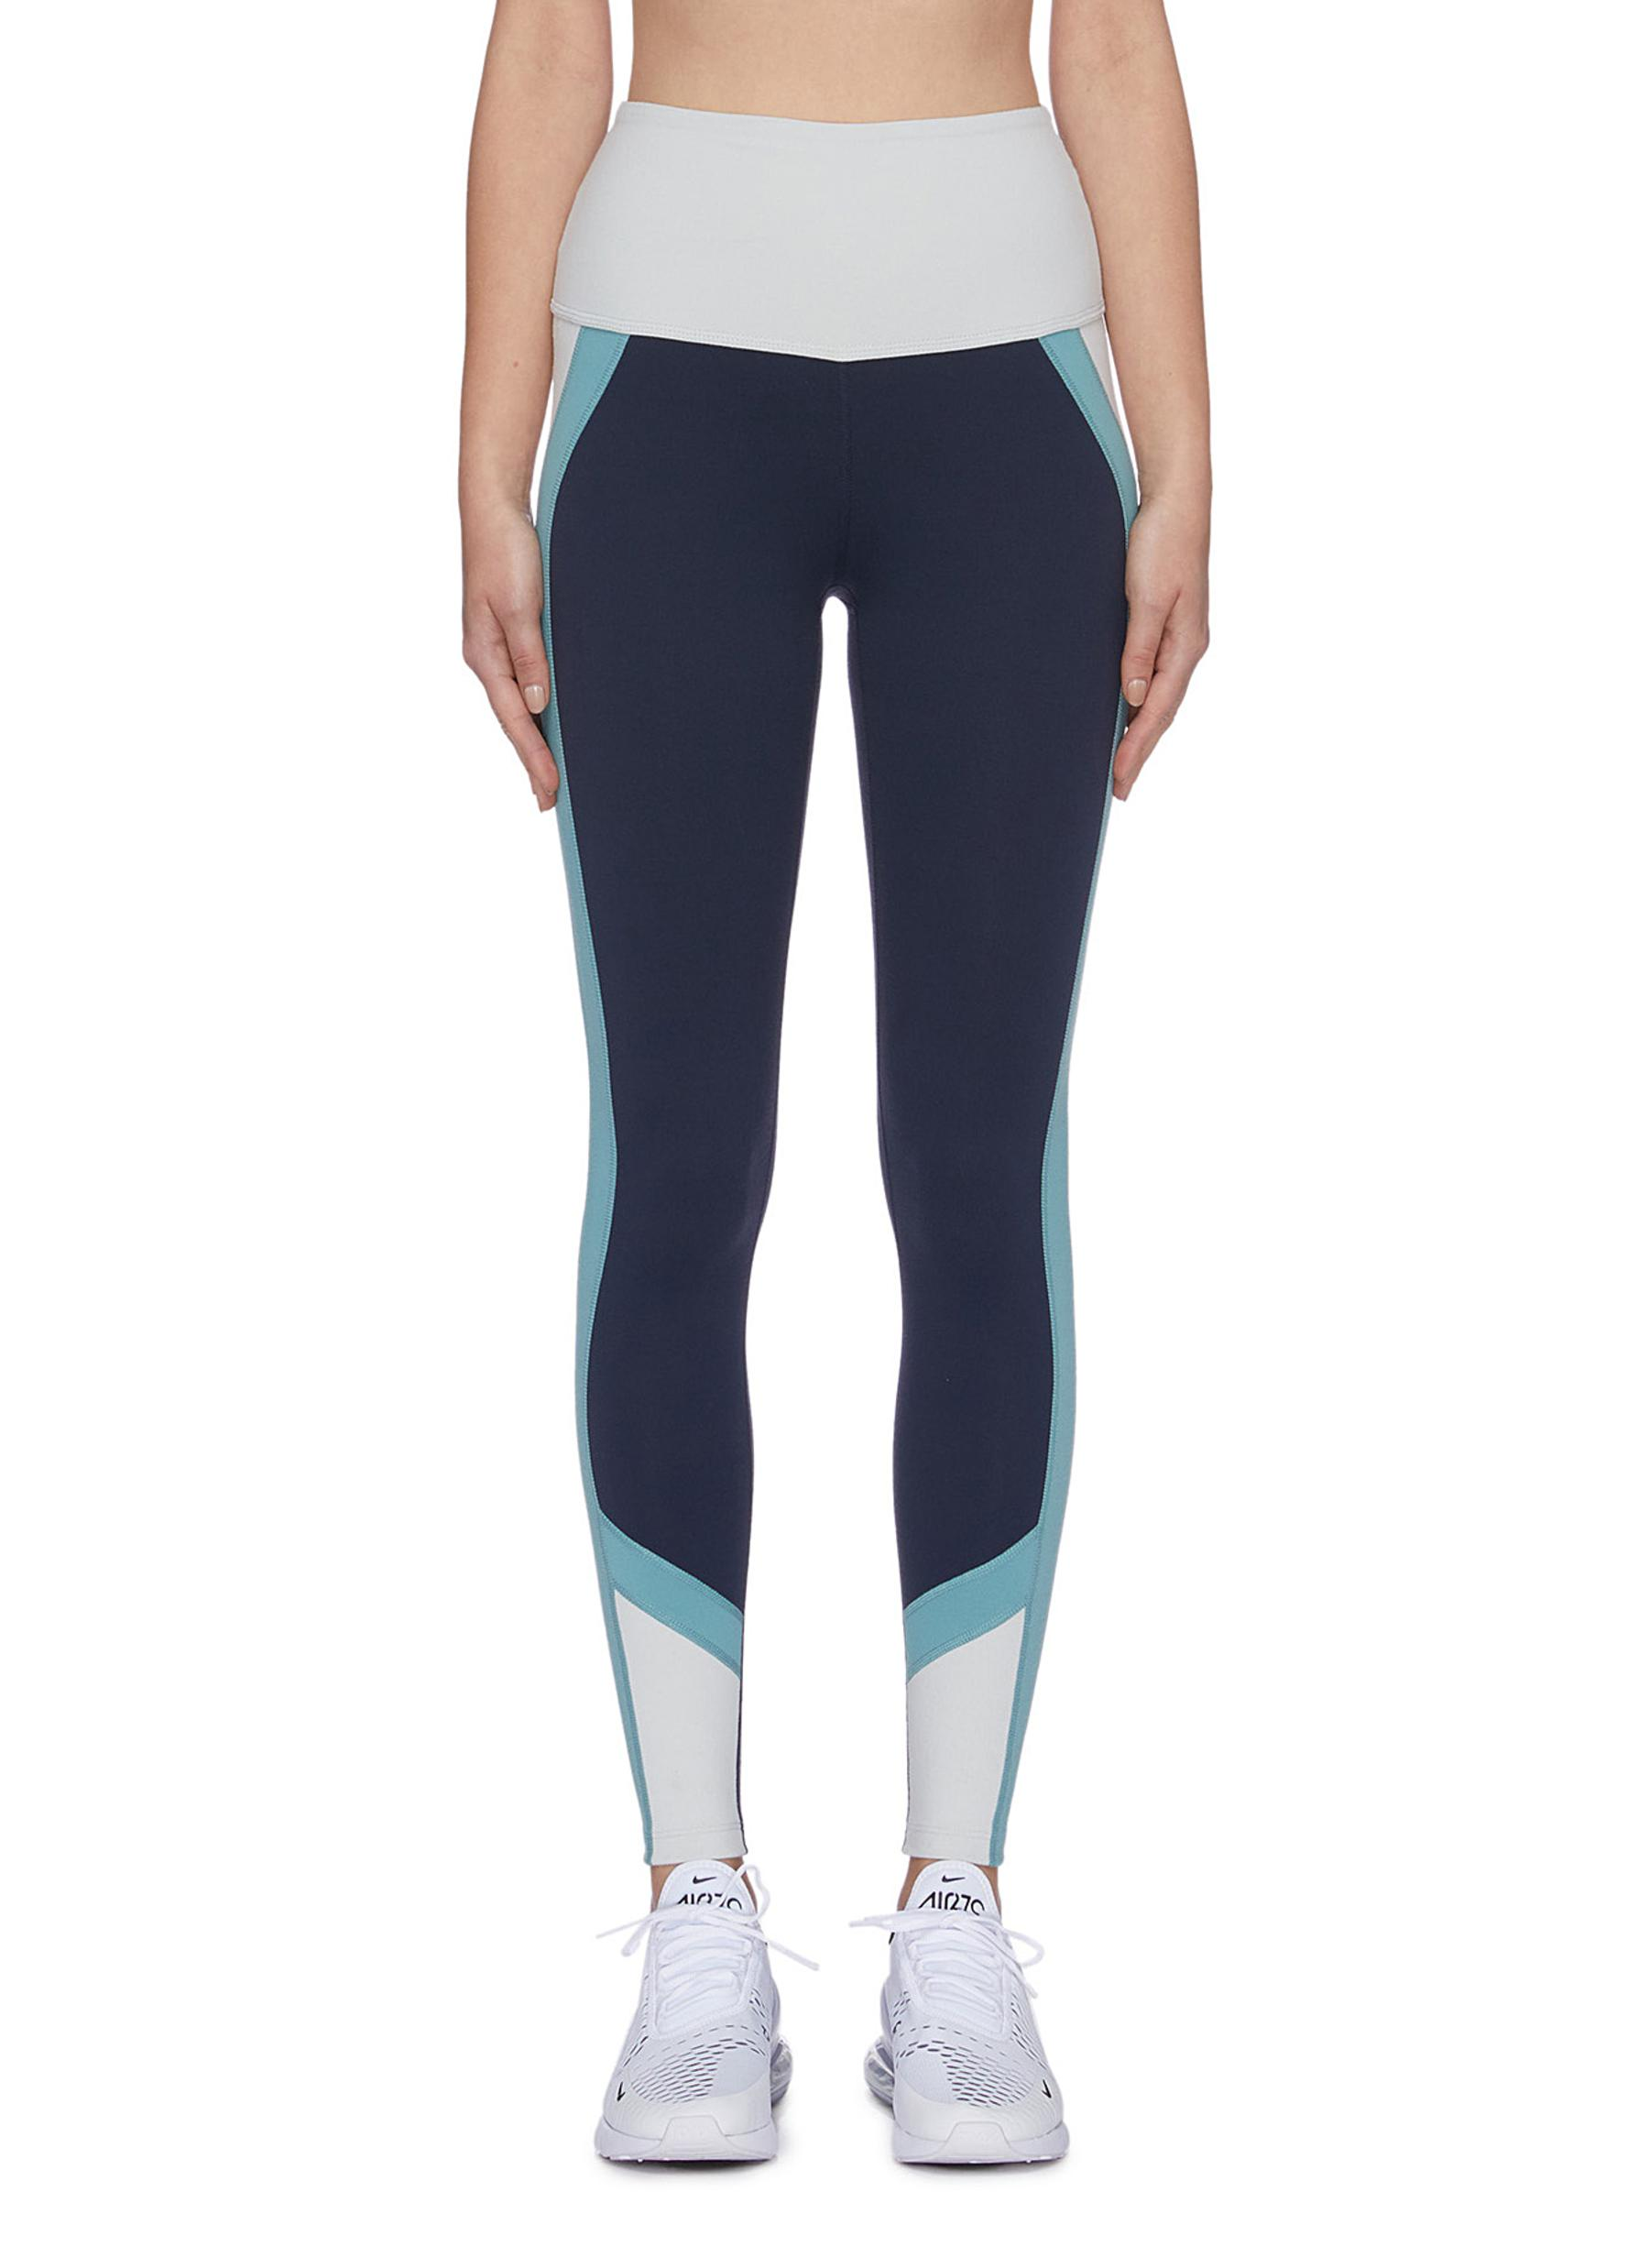 True Colorblock performance leggings by Beyond Yoga